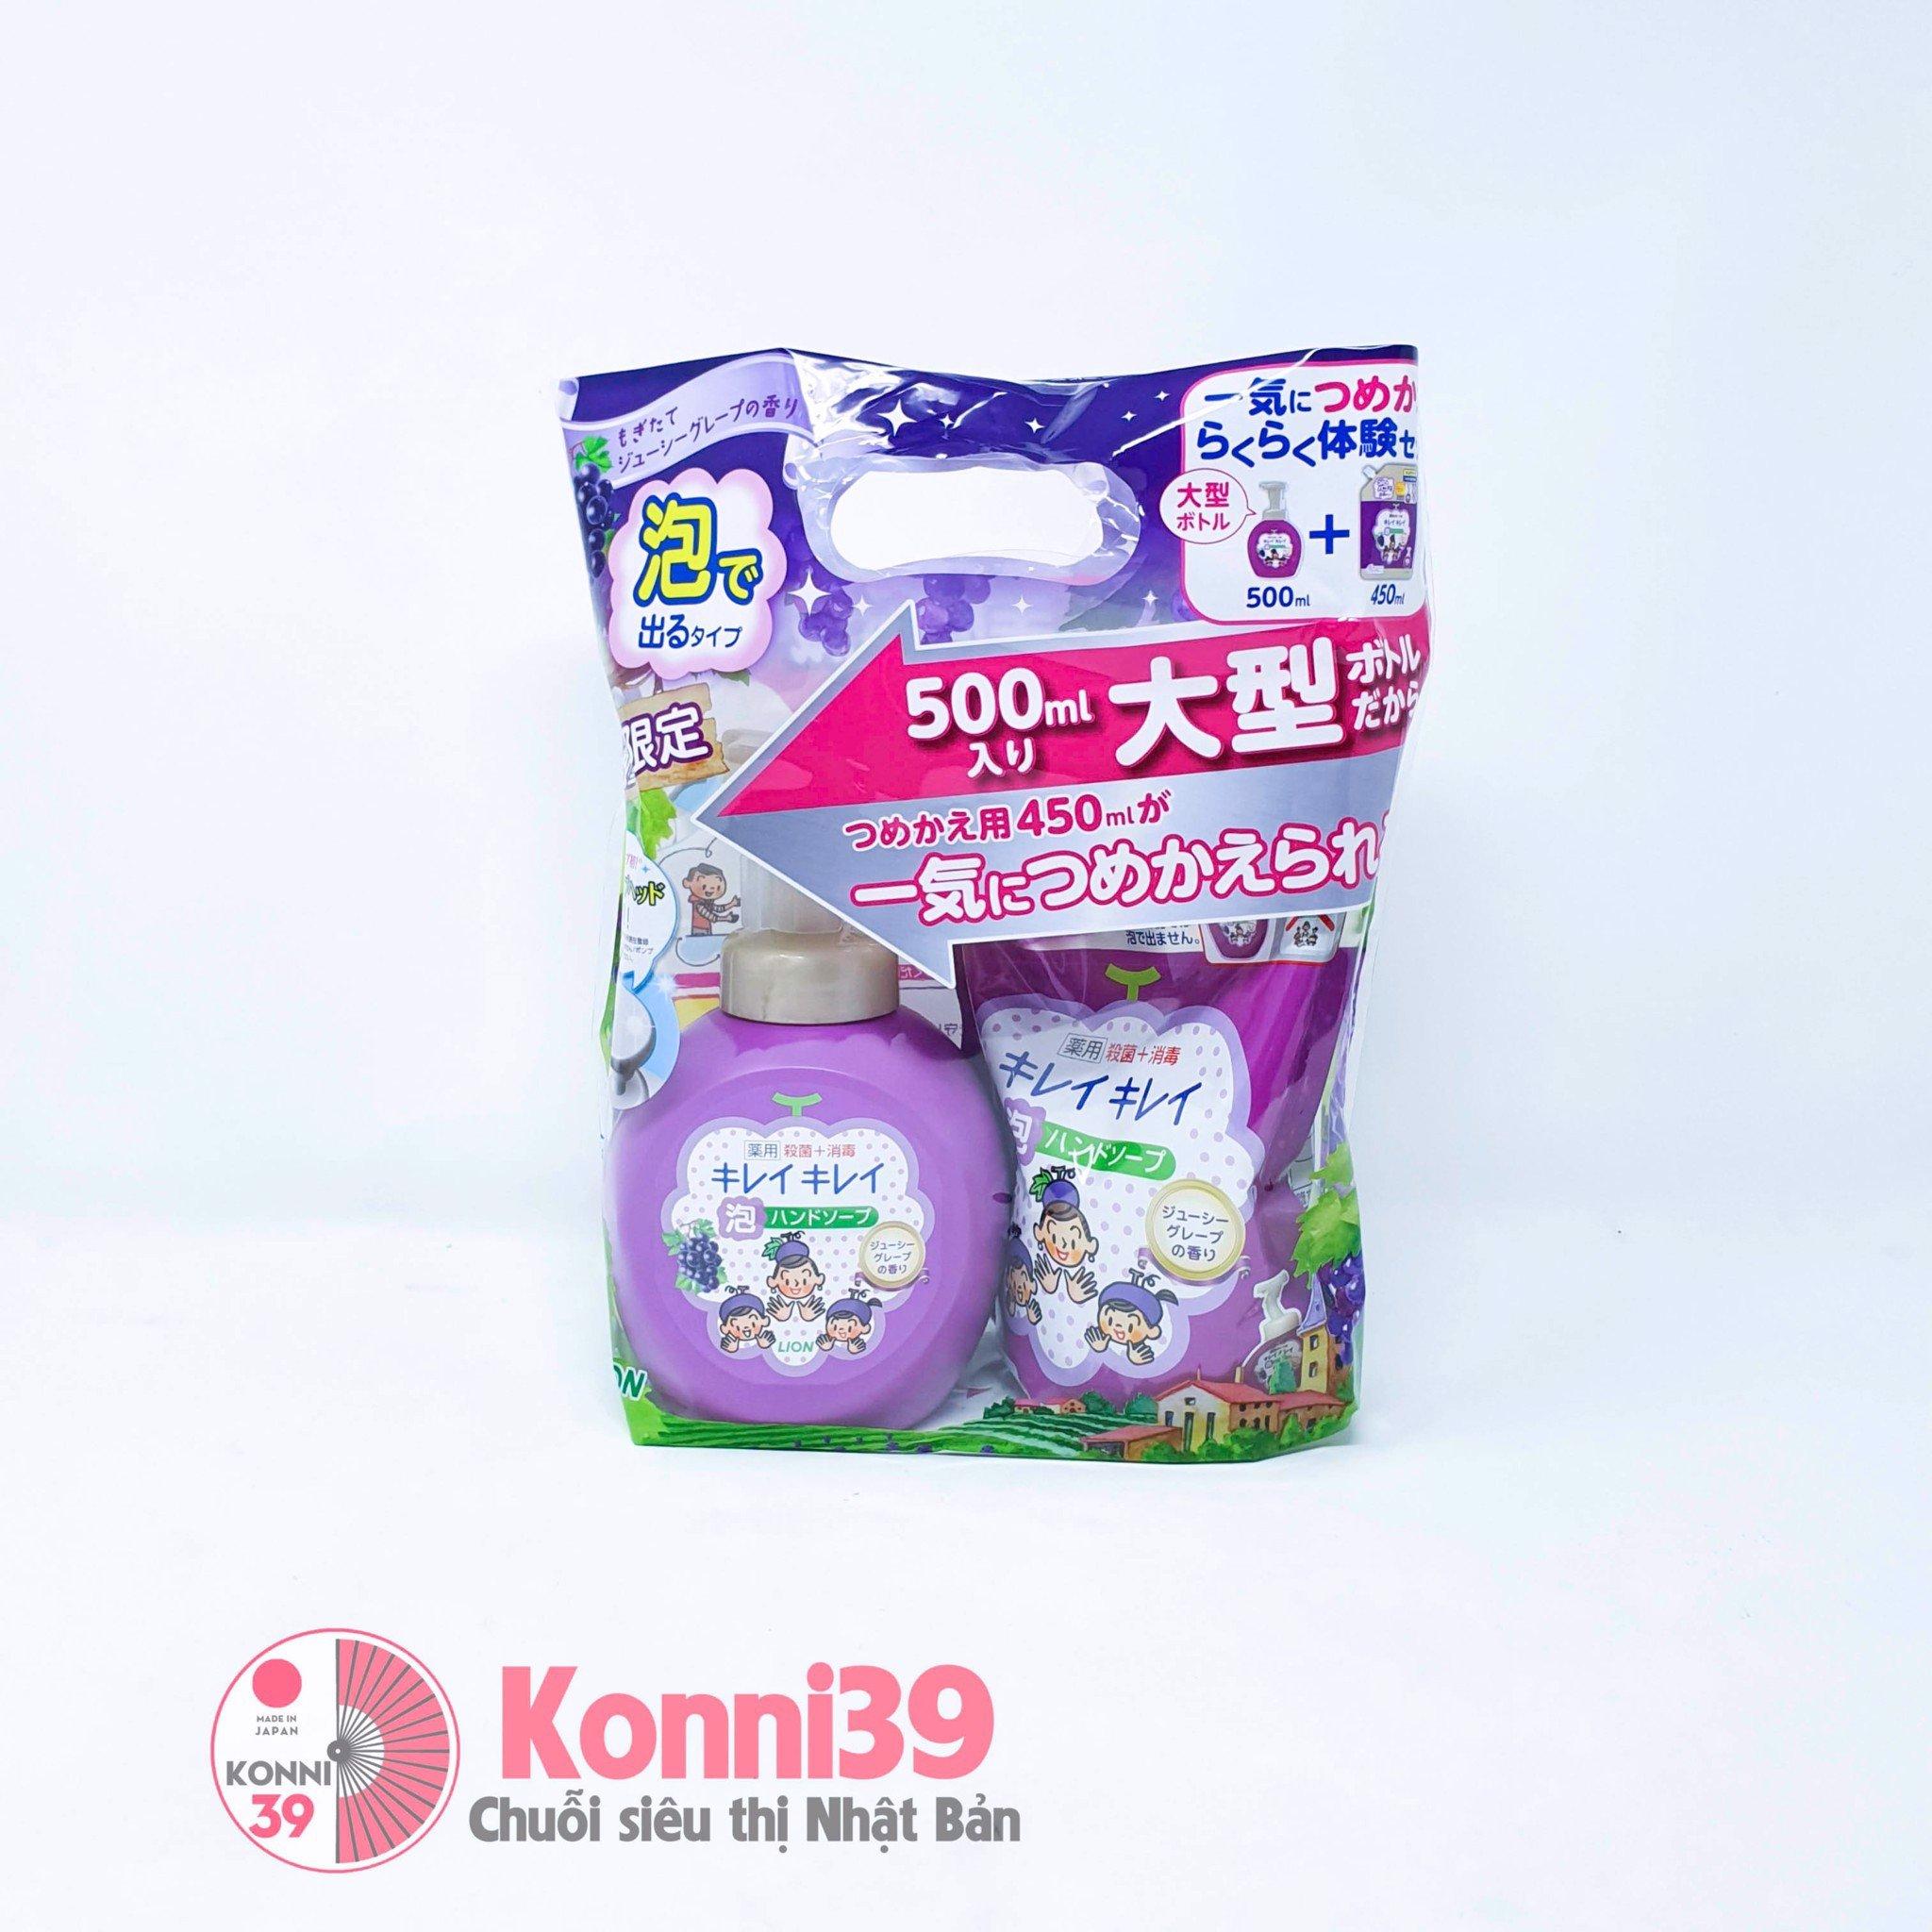 Nước rửa tay Lion Kirei Kirei 500ml kèm túi refill 450ml (2 loại)